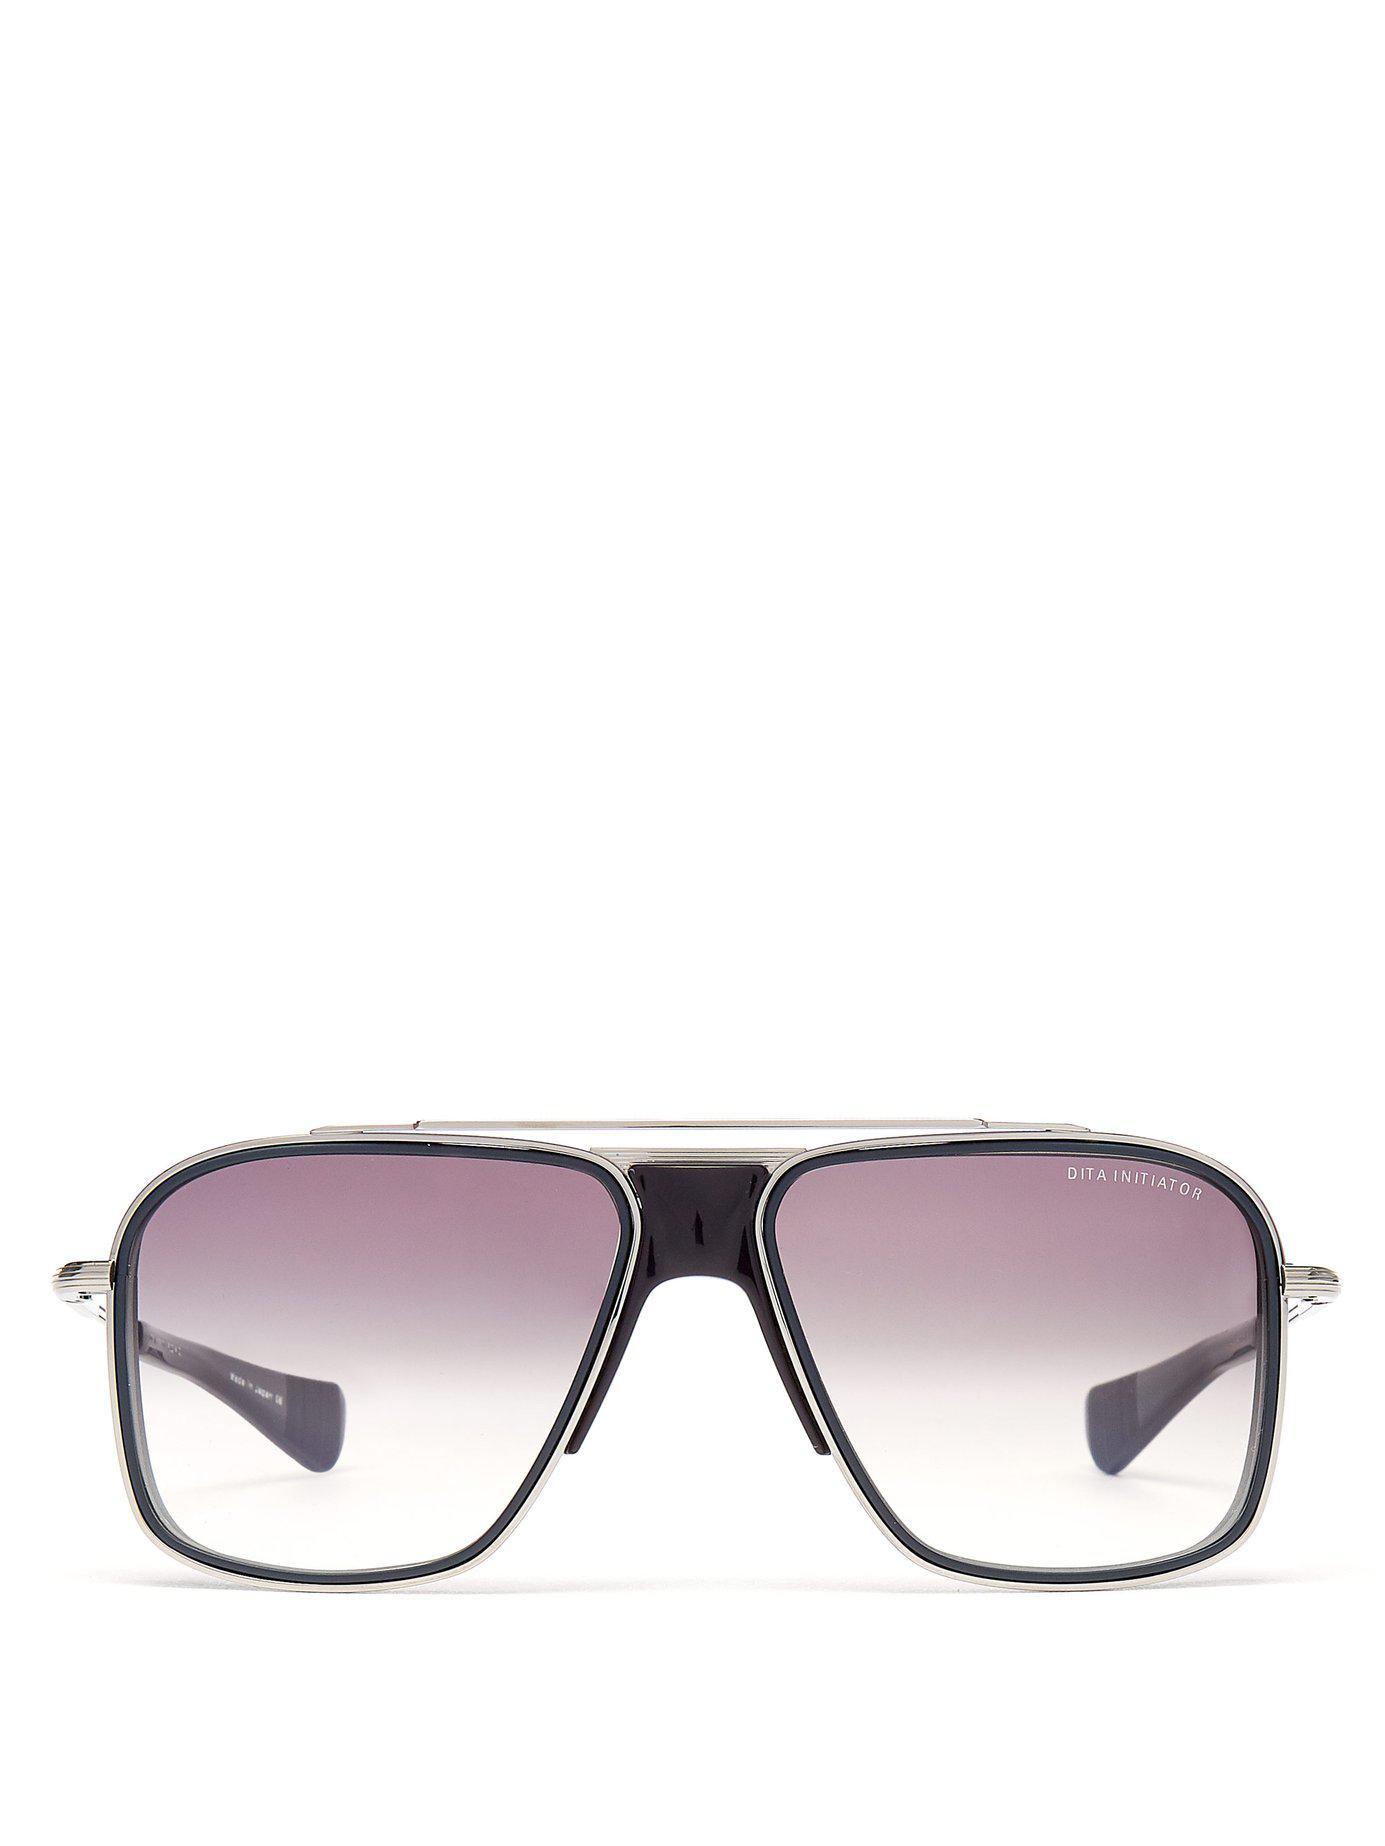 b7779debcfe Lyst - Dita Eyewear Initiator Aviator D Frame Titanium Sunglasses in ...